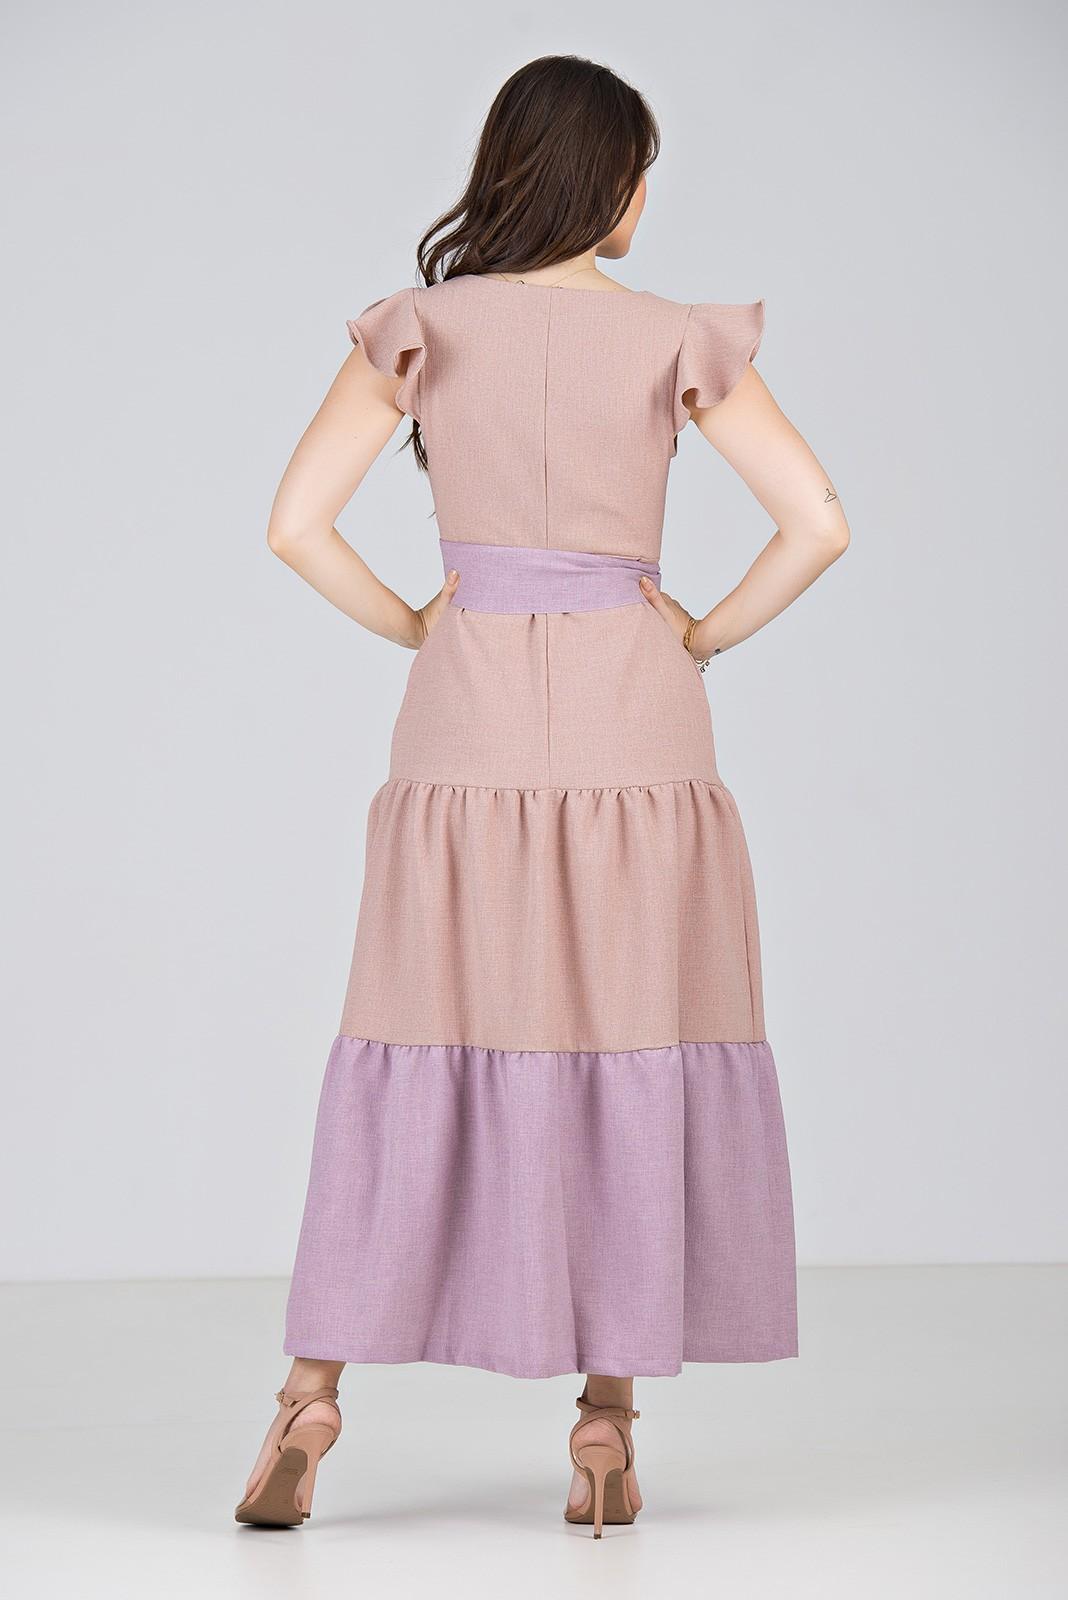 Vestido Longo em Linha Texturizada Bicolor Rosê\Lilás - Midsize